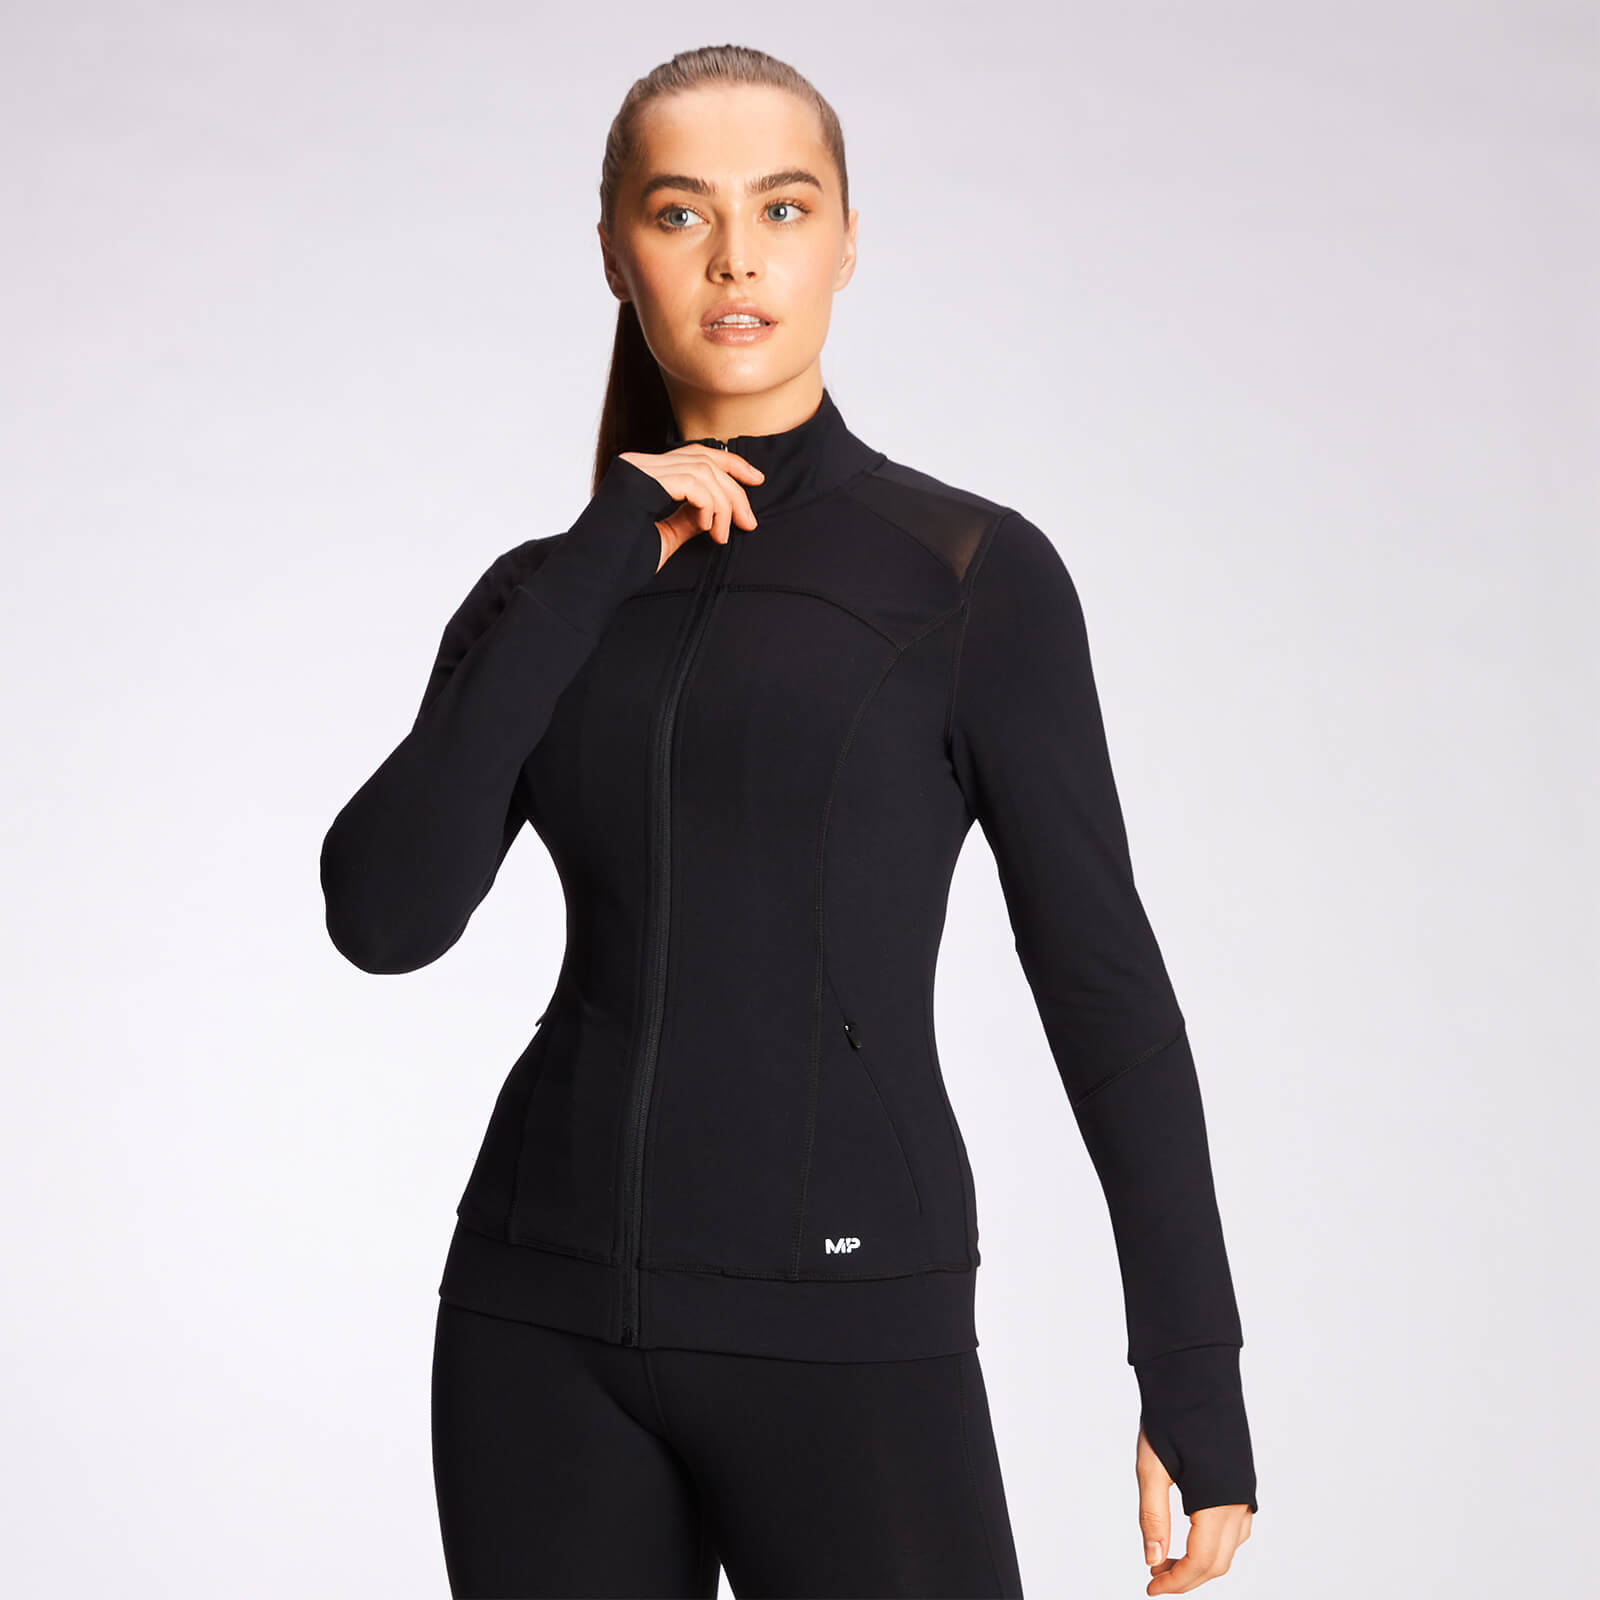 Купить MP Women's Power Mesh Jacket - Black - XXS, Myprotein International